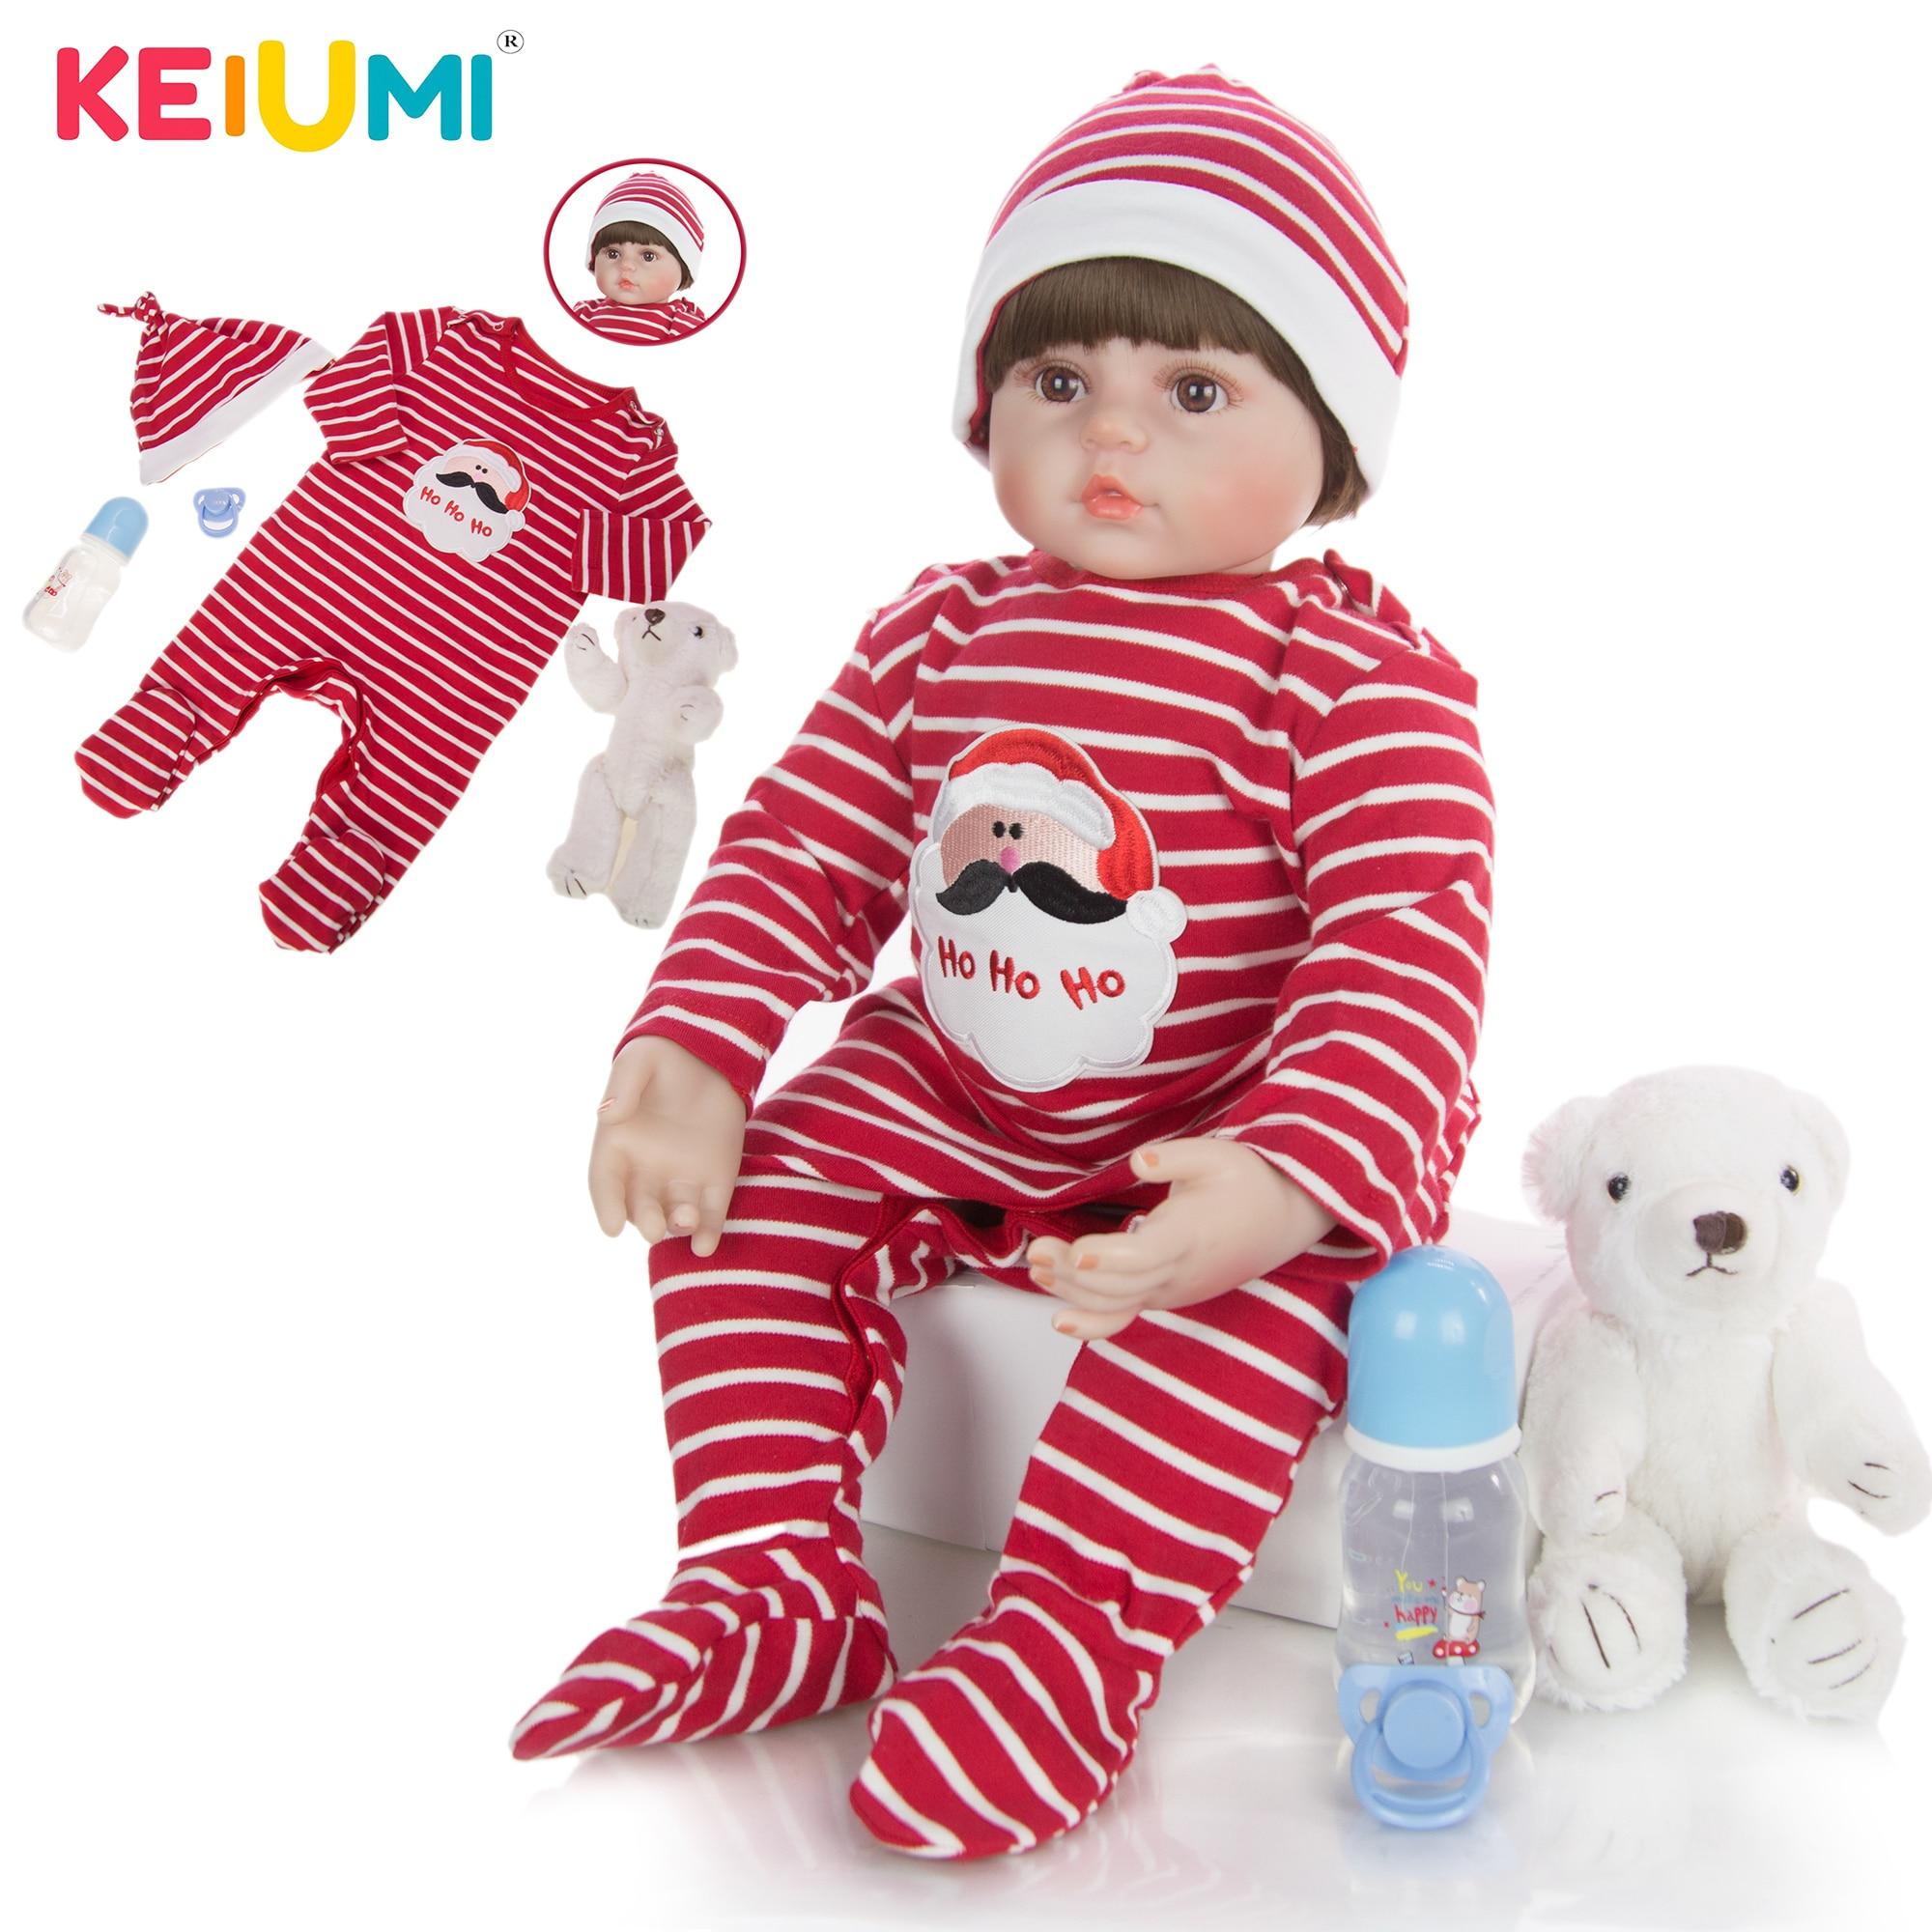 24 Inch 60 cm Realistic Reborn Baby Dolls Silicone Soft Cotton Body Fashion Boneca Reborn For Kids Christmas Gift Best Playmates(China)